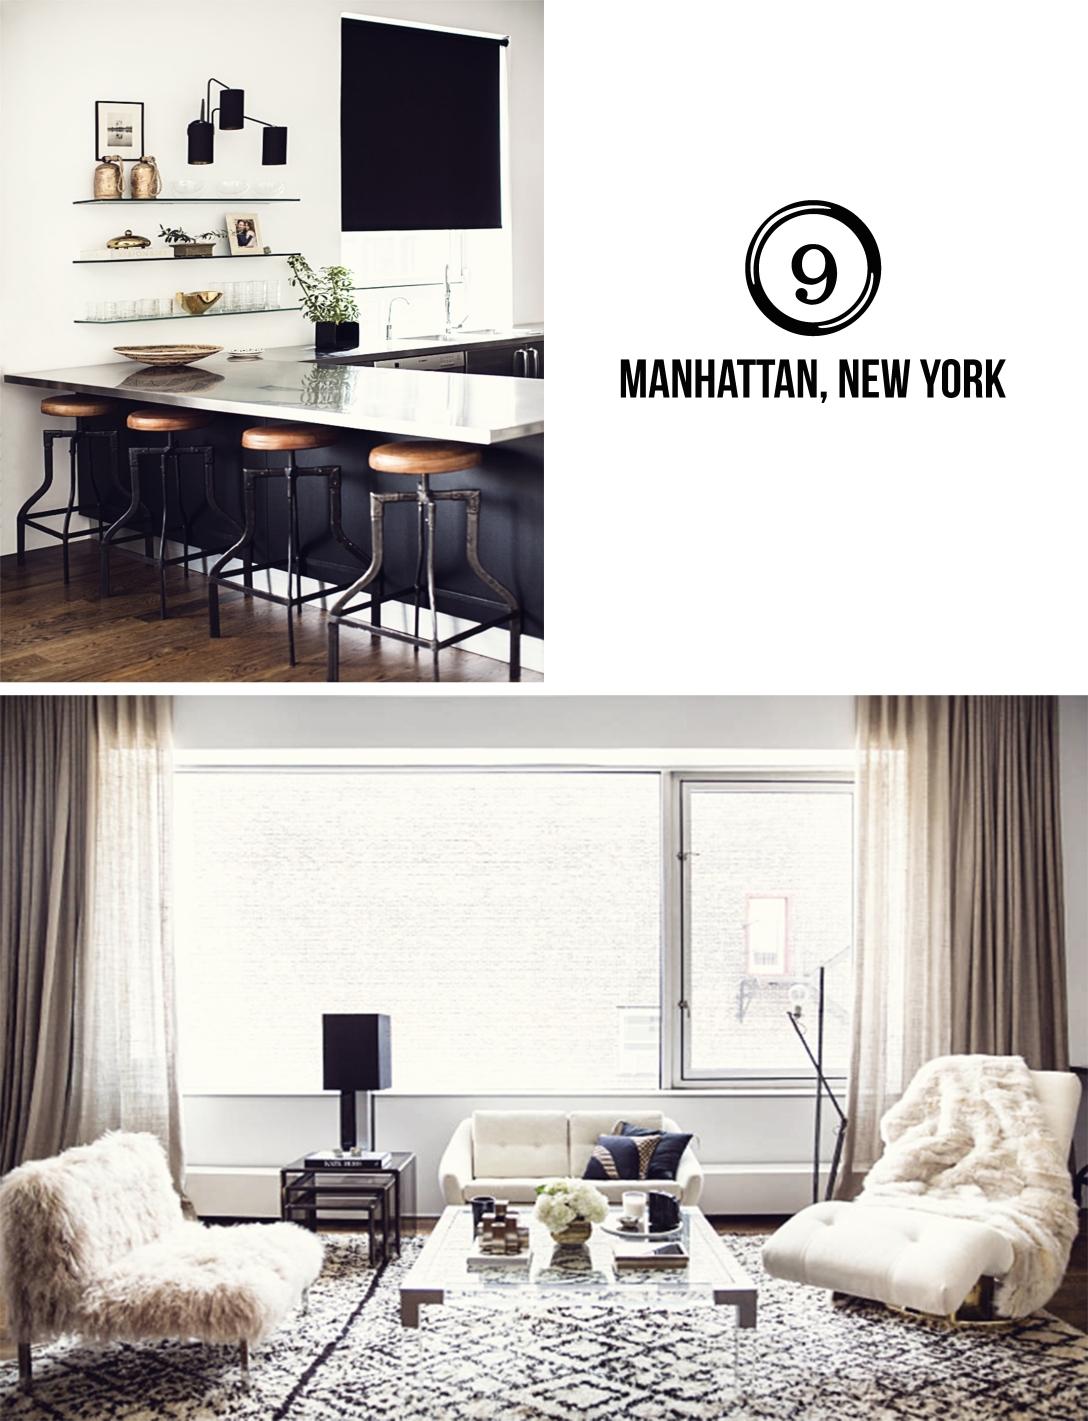 manhattan, new york3